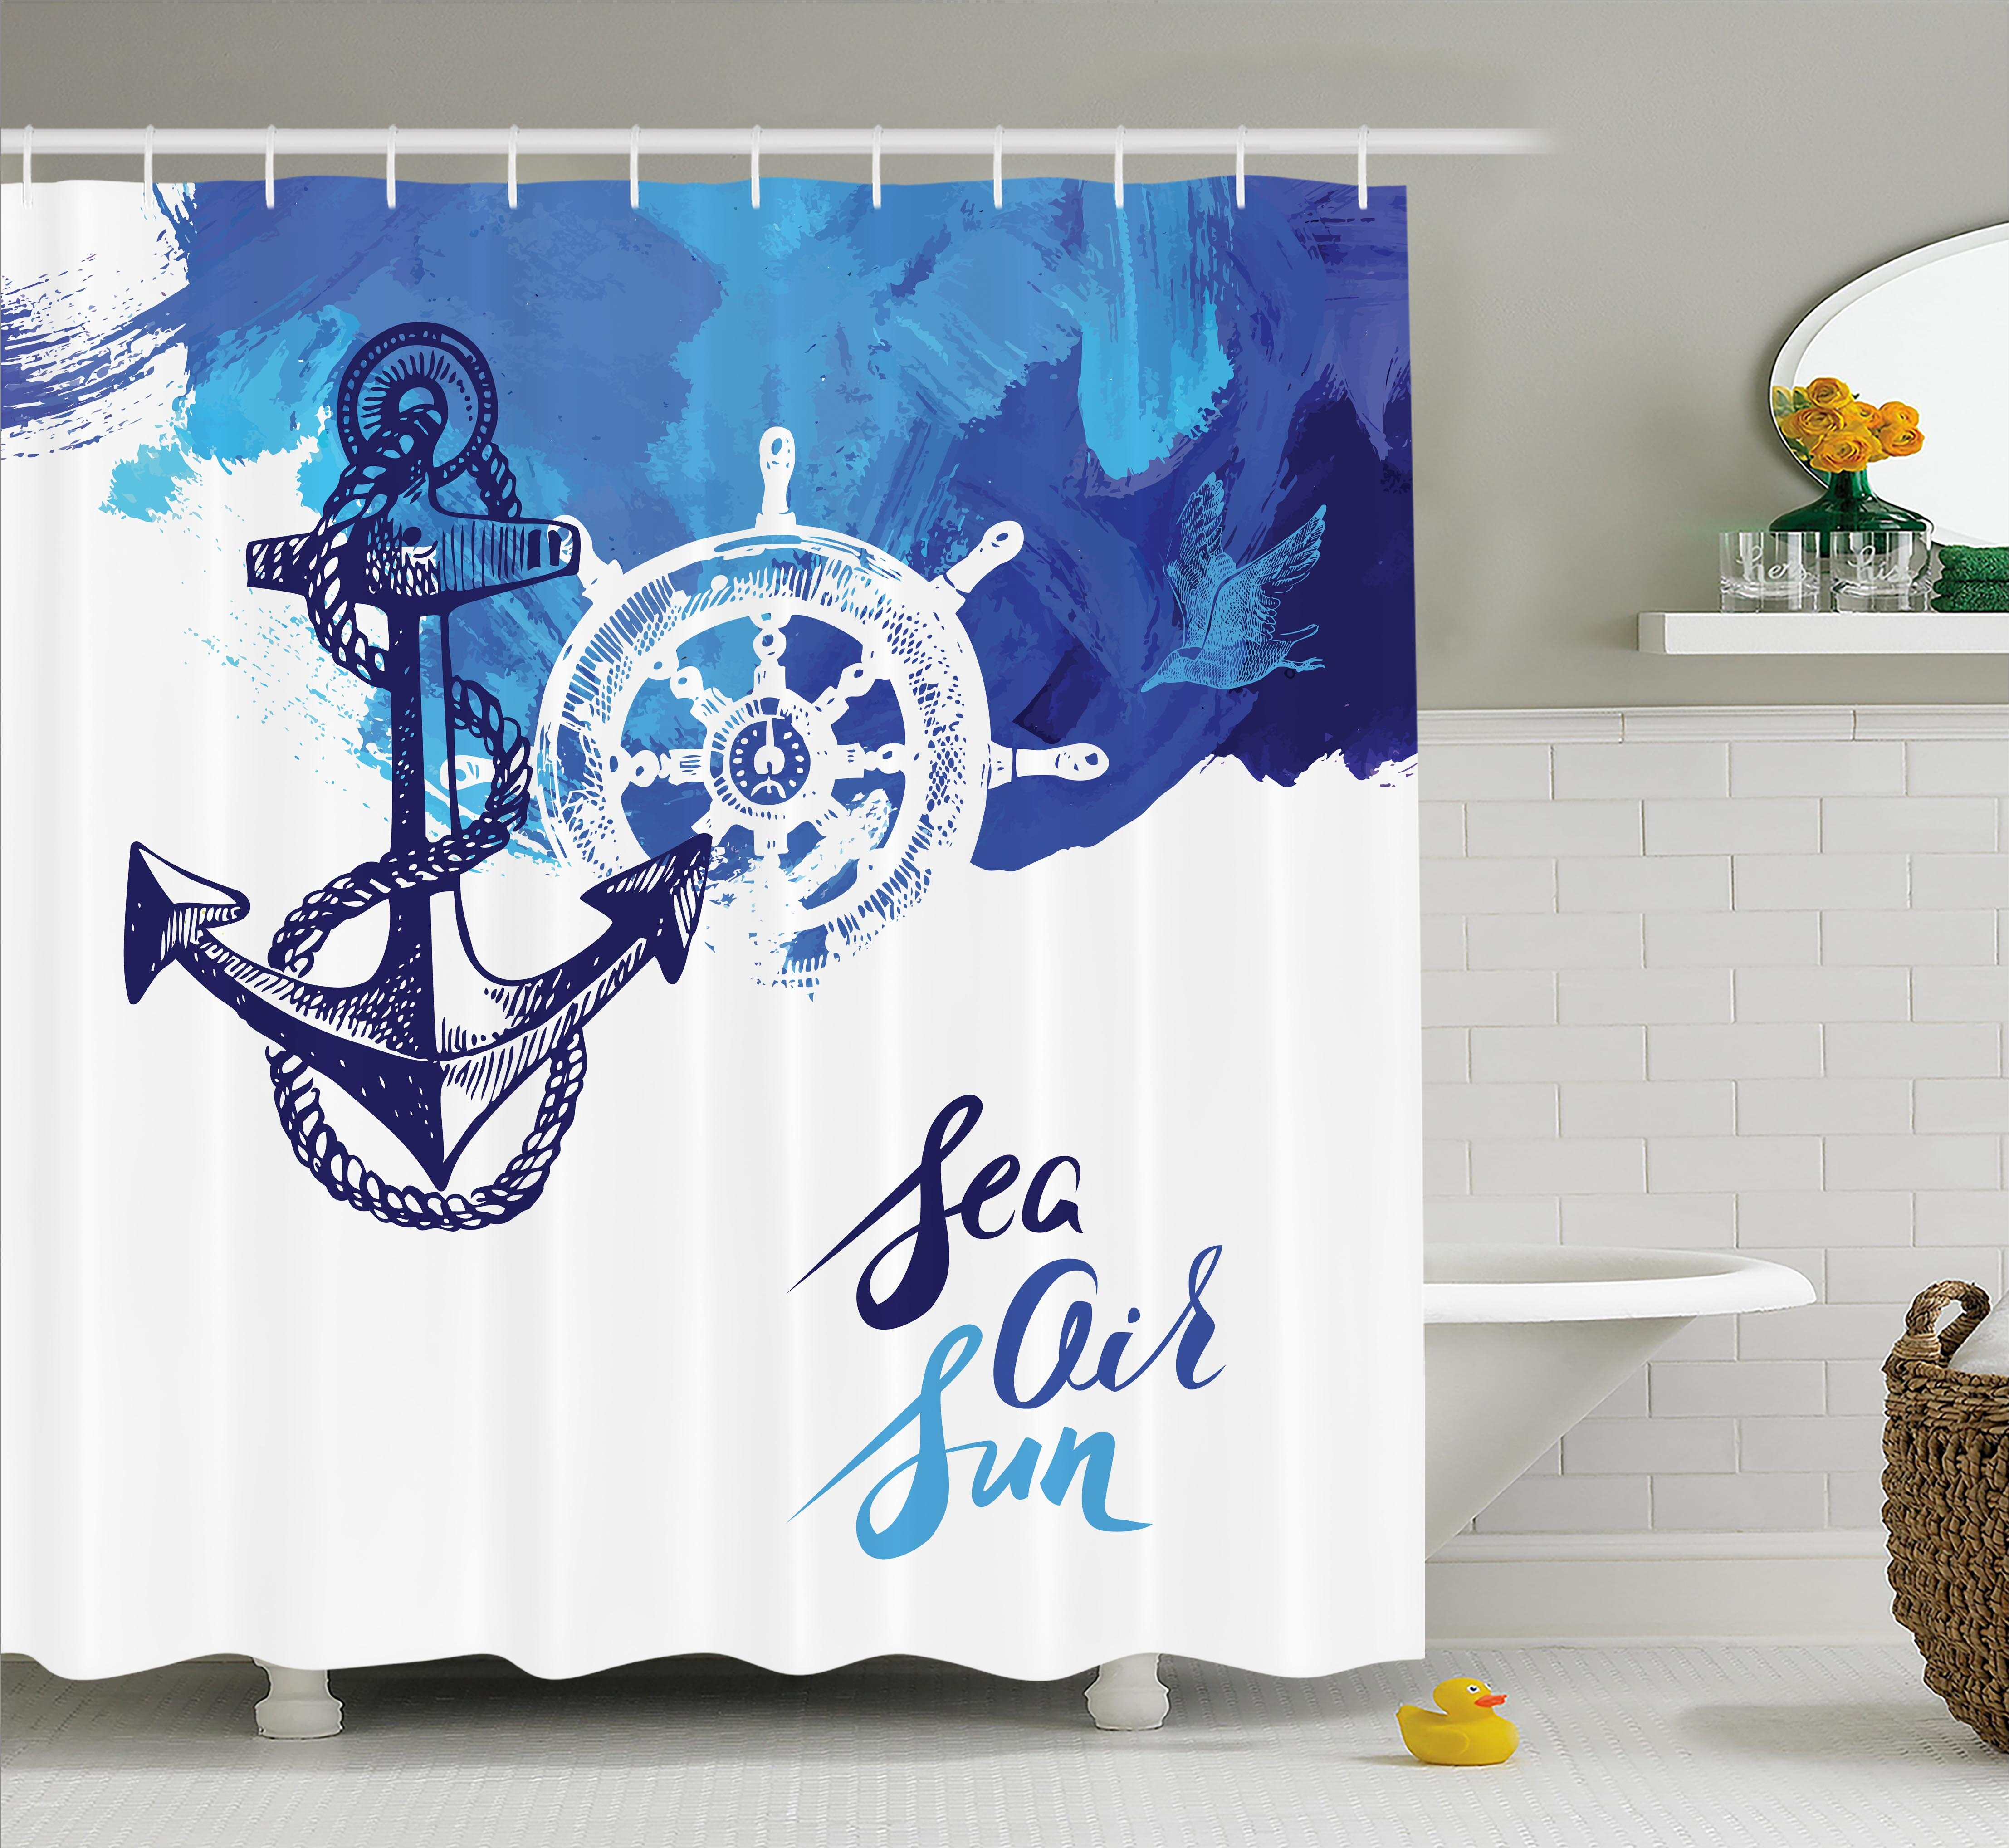 East Urban Home Rudder Cruise Nautical Decor Single Shower Curtain Wayfair